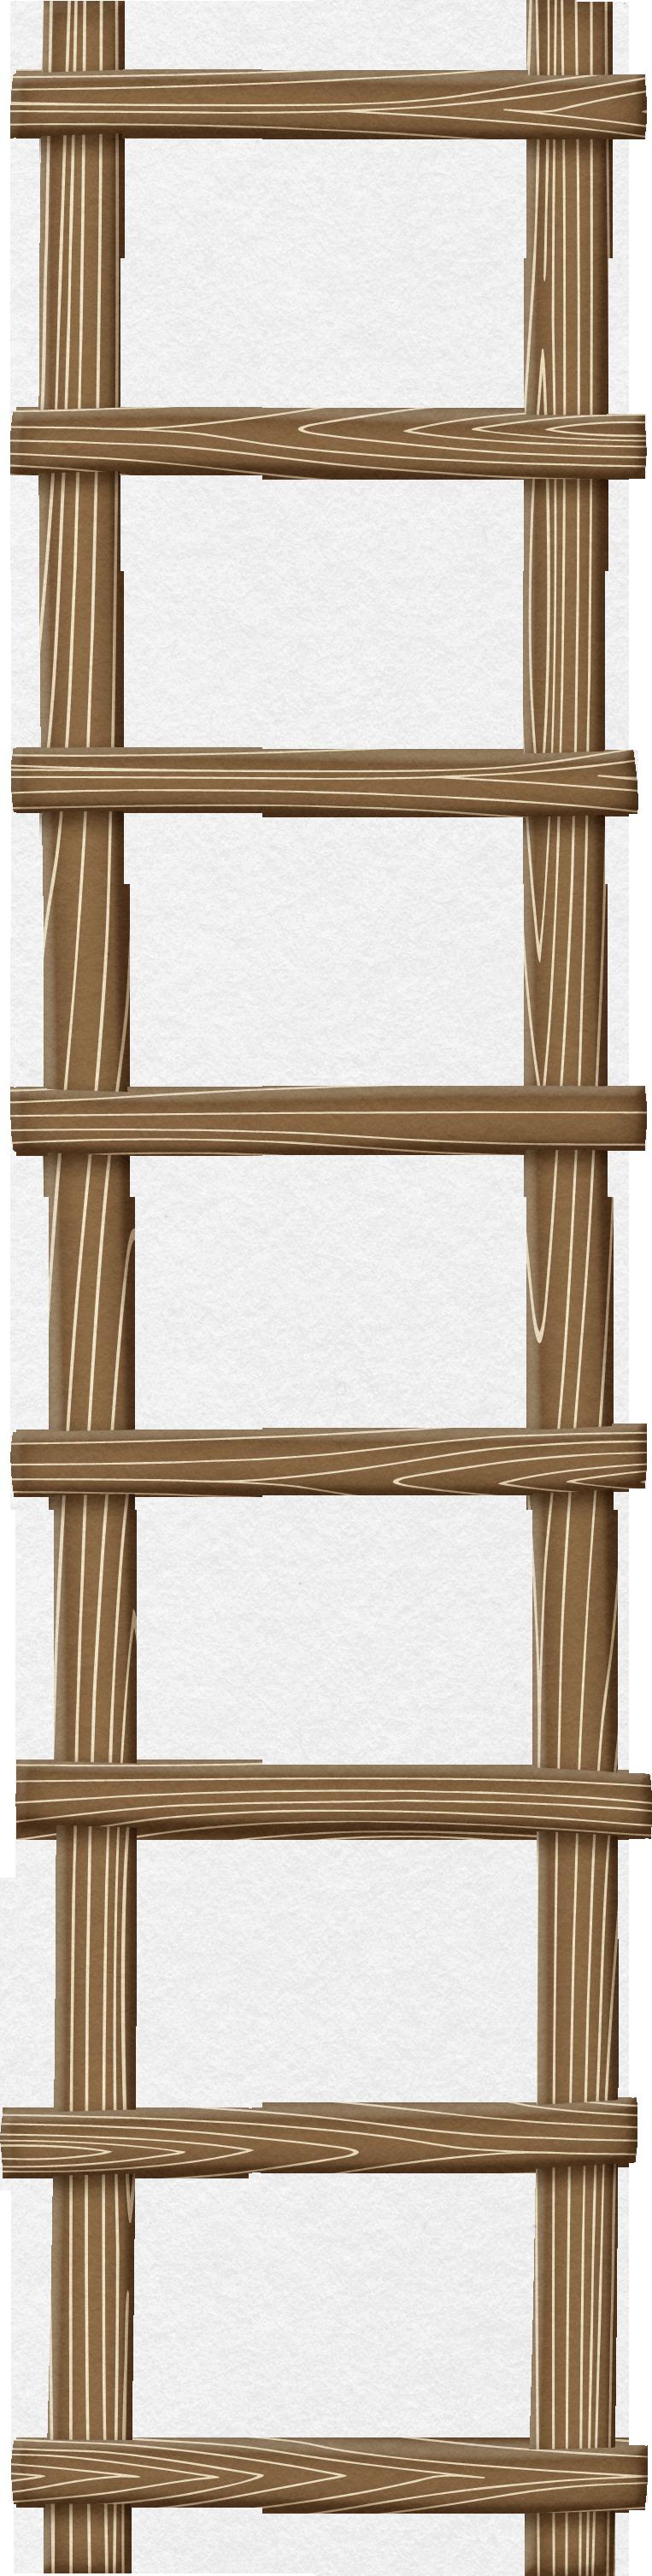 clipart free ladder transparent wooden #98701469